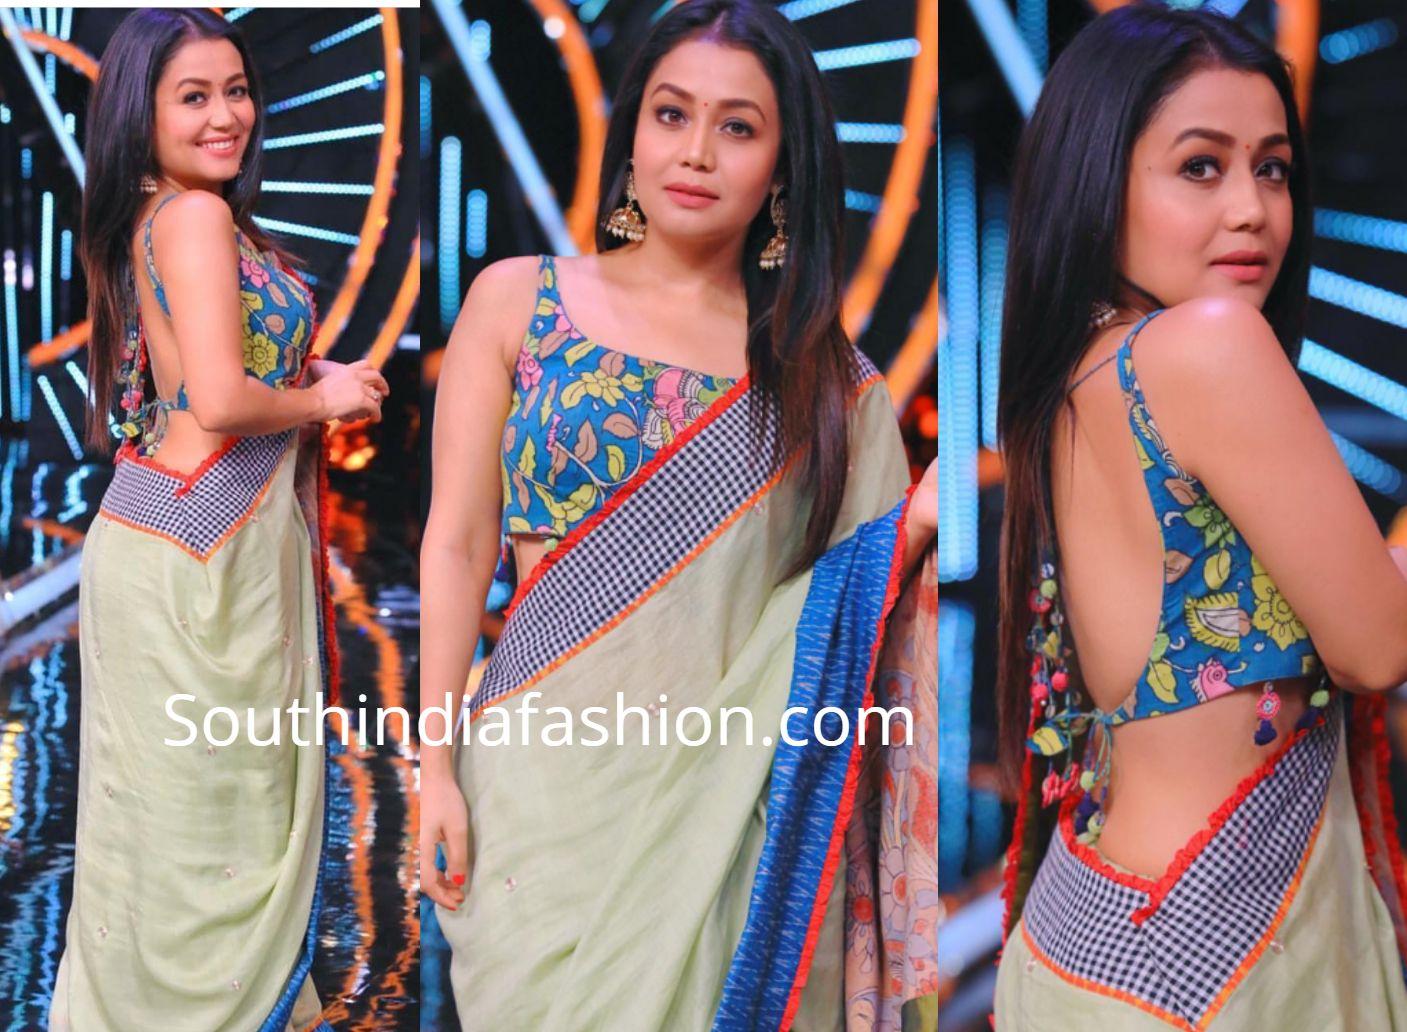 Neha Kakkar In A Kalamkari Saree South India Fashion Neha Kakkar Dresses Kalamkari Saree Backless Blouse Designs